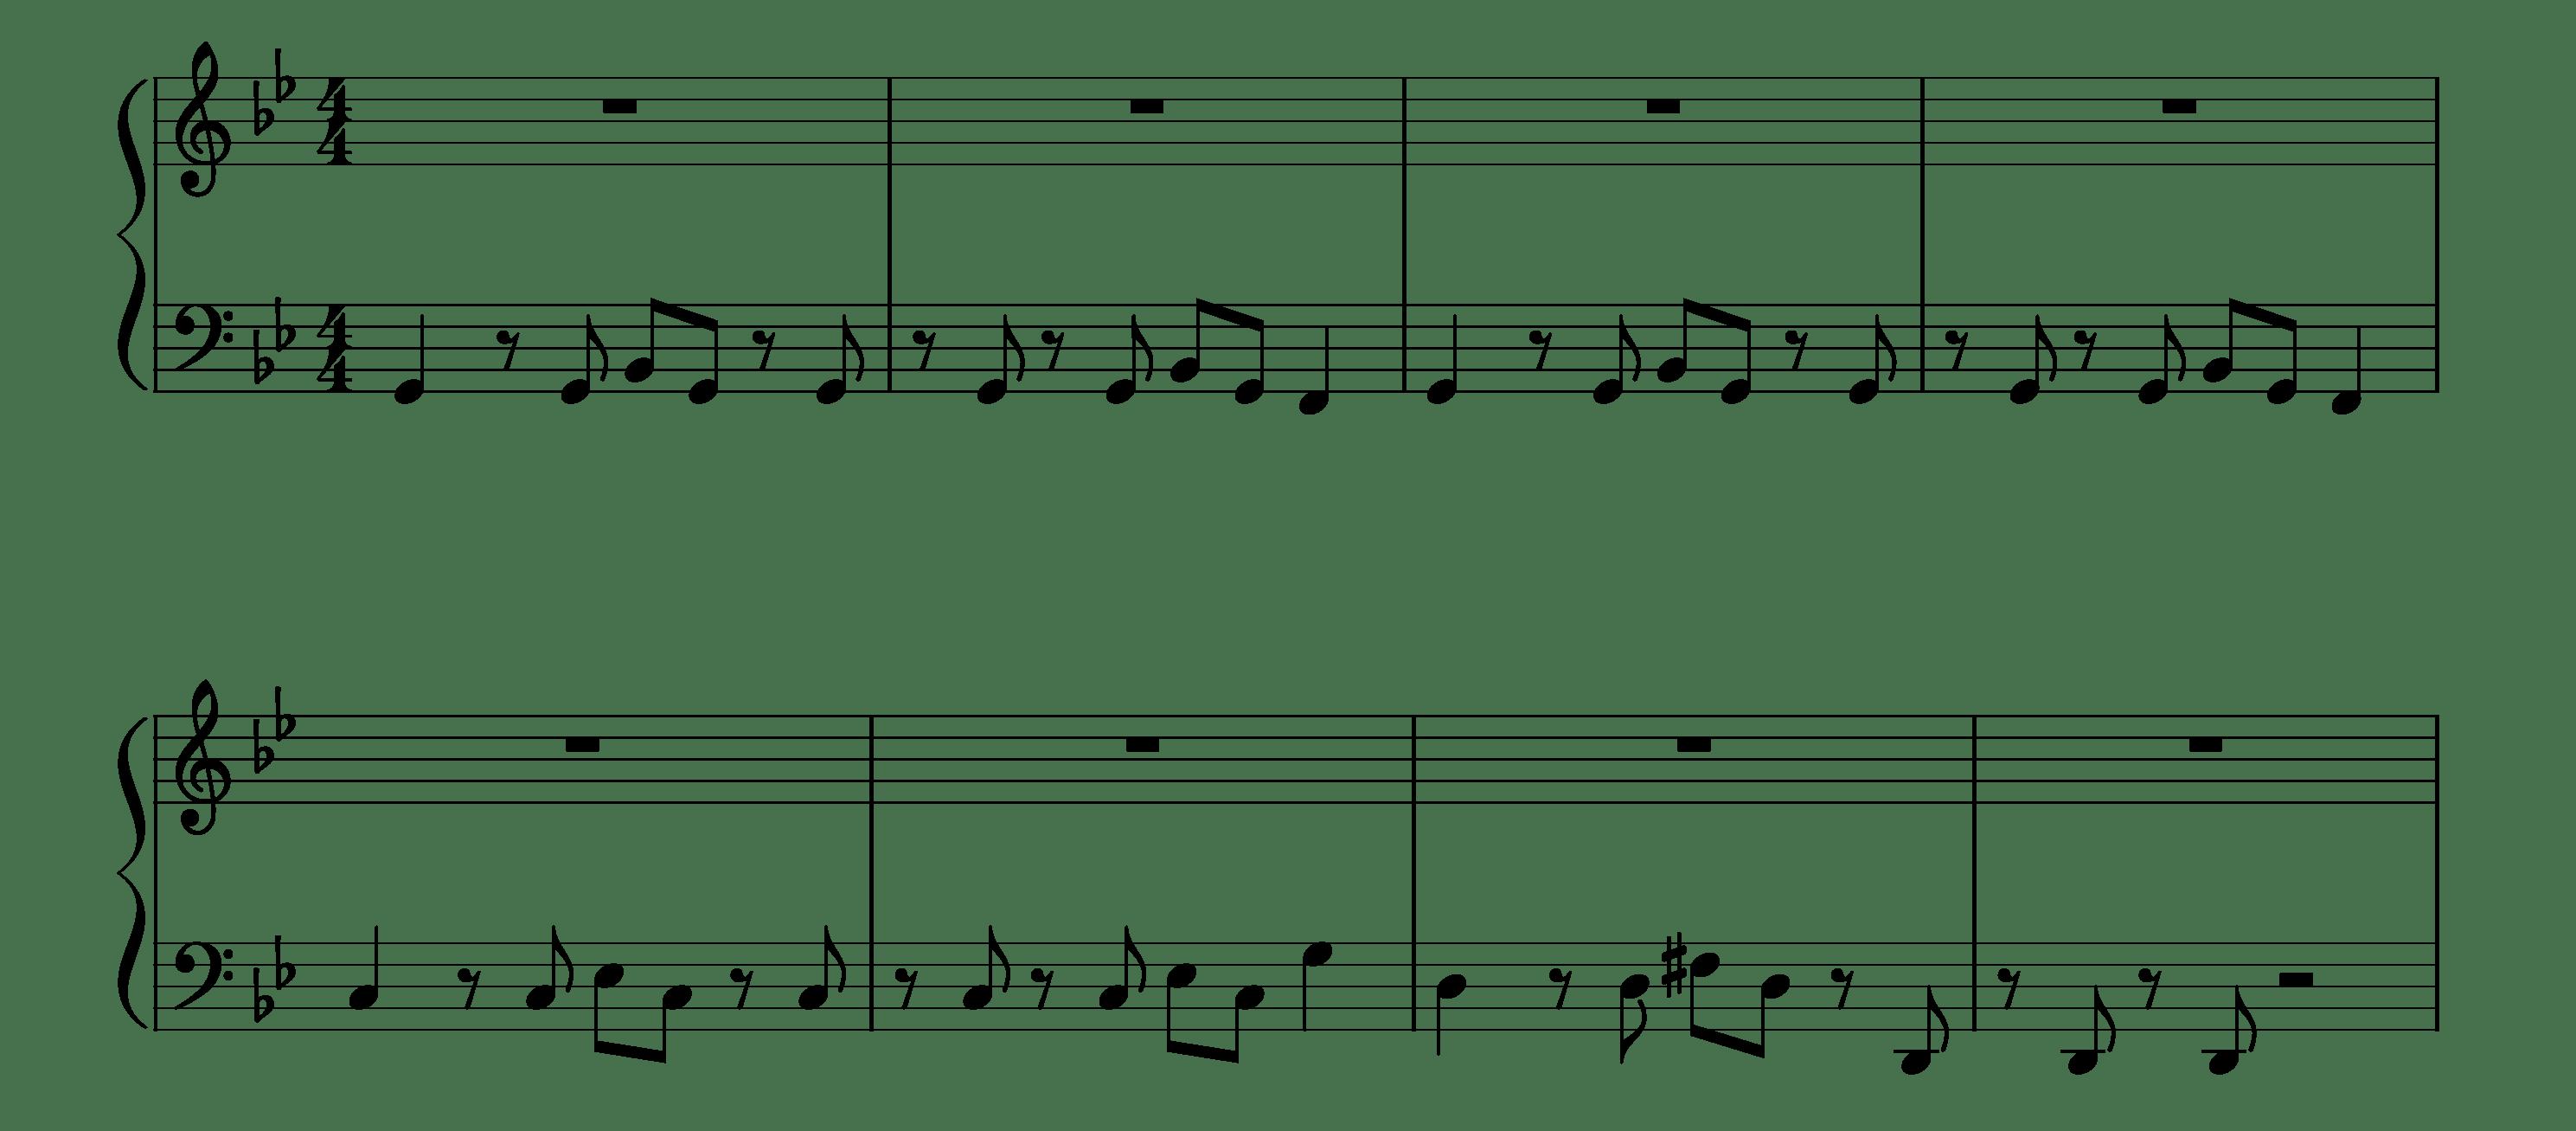 Bad Guy Piano Sheet Music - Intro - Easy Version